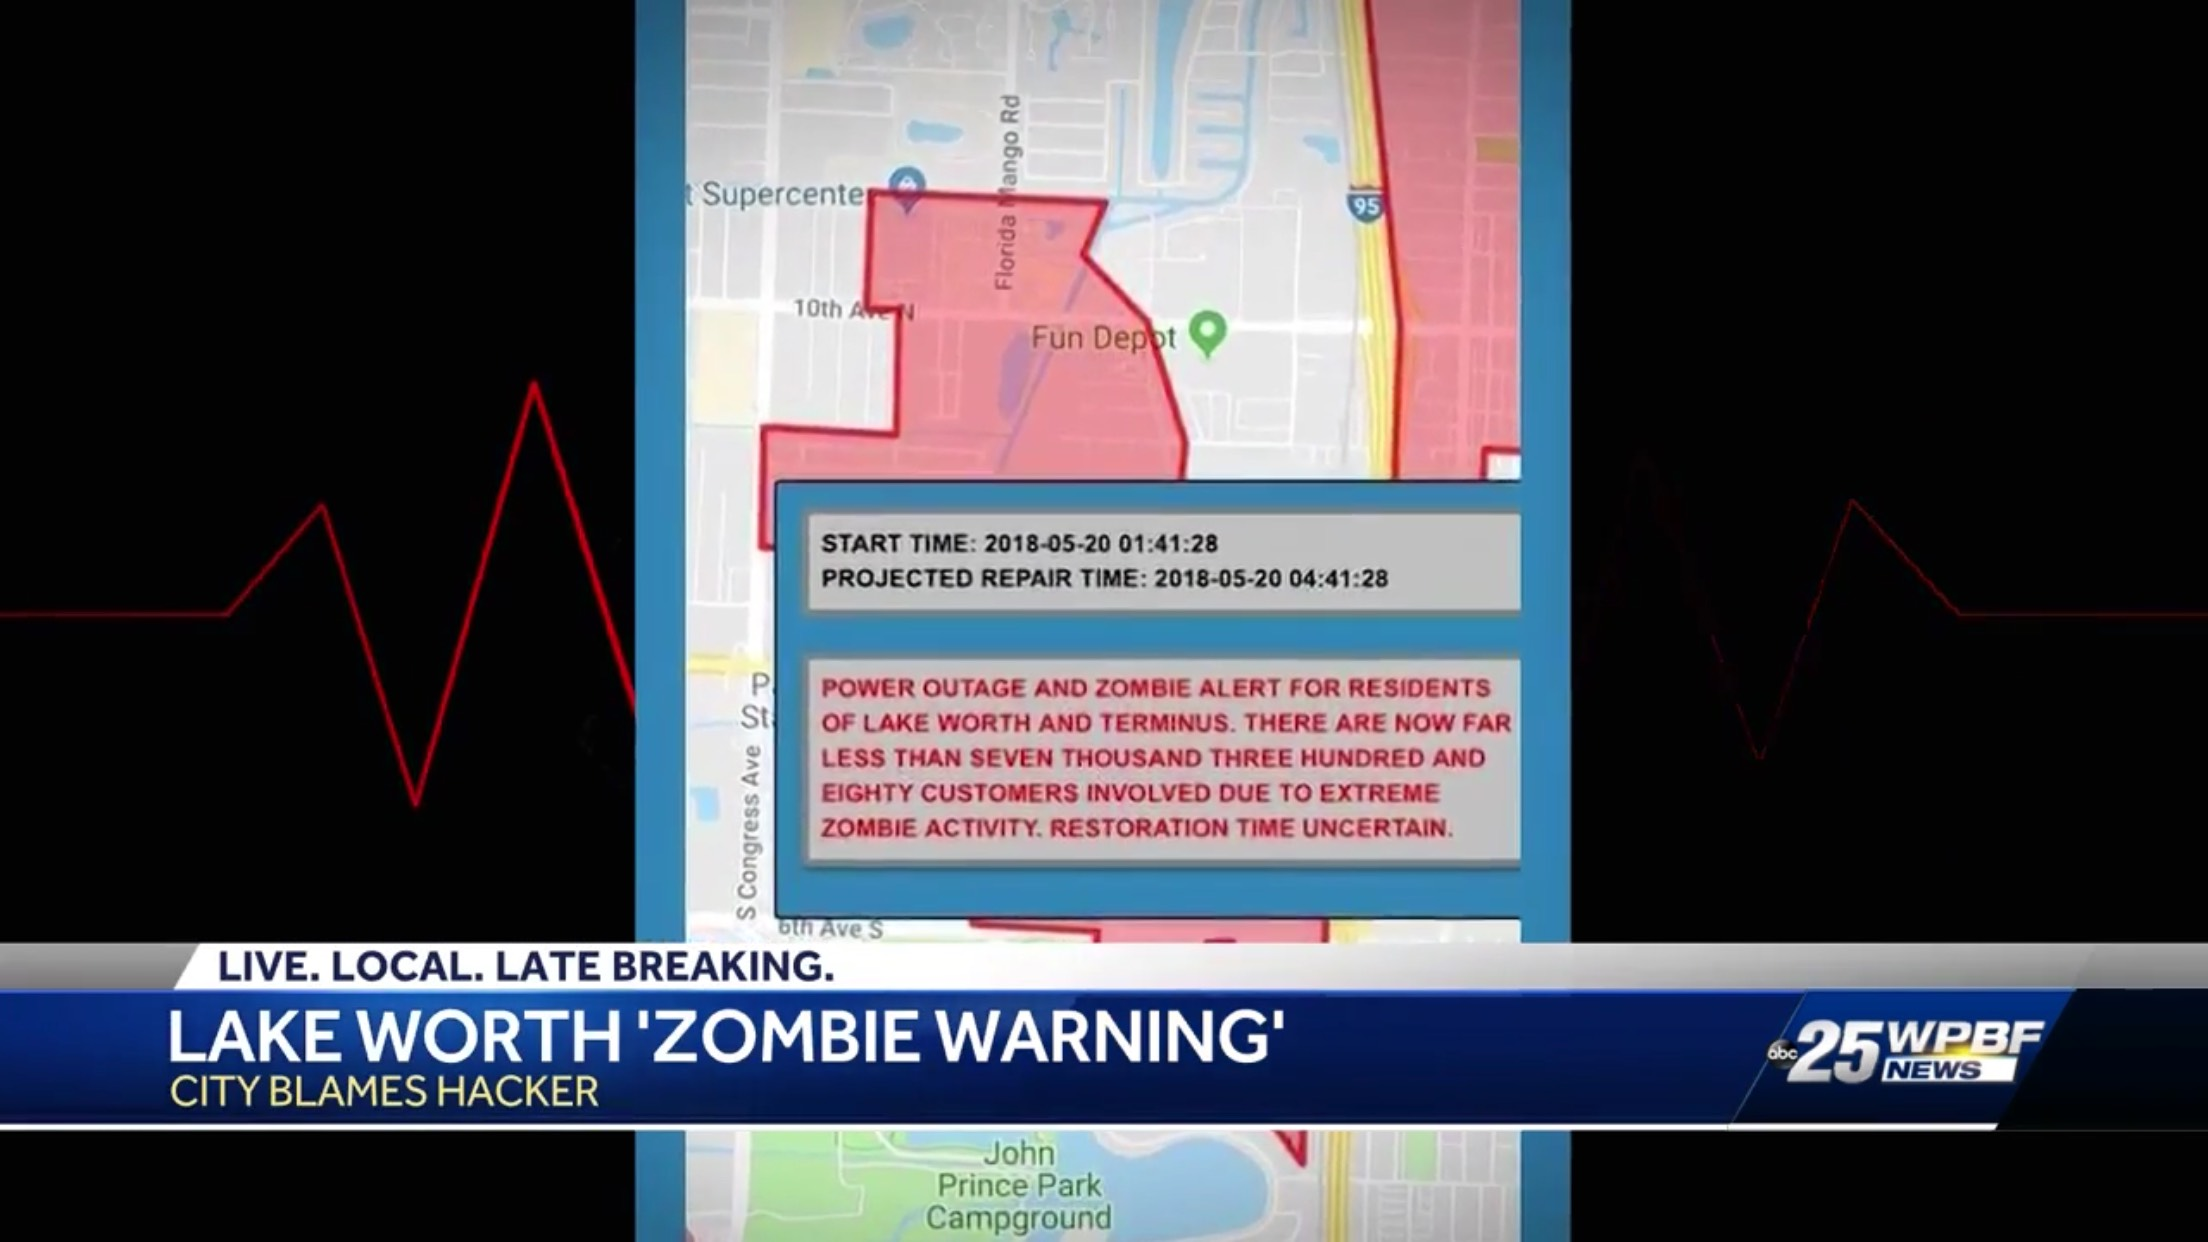 Lake Worth 'Zombie Warning': City Blames Hacker